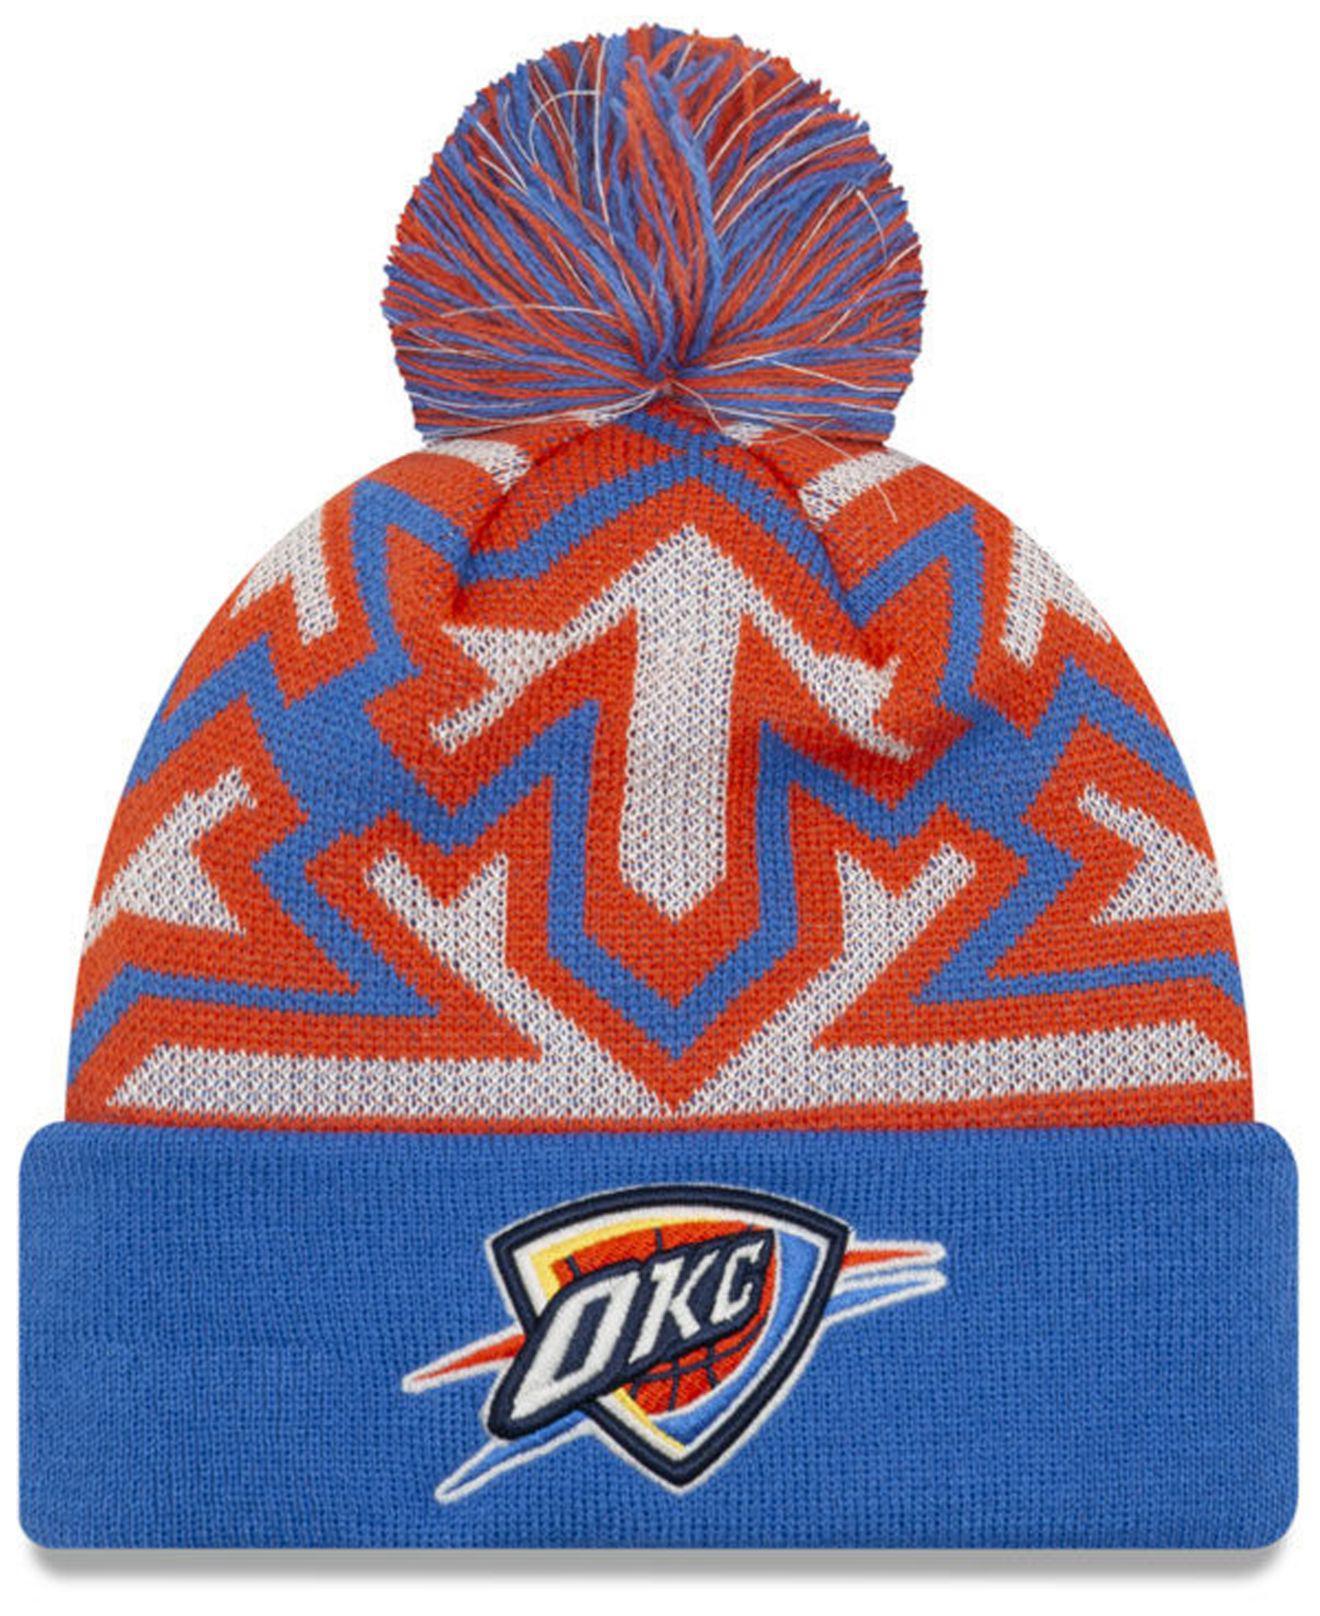 48ada4e51 uk dallas mavericks new era nba on court collection cuff knit 87d2c ...